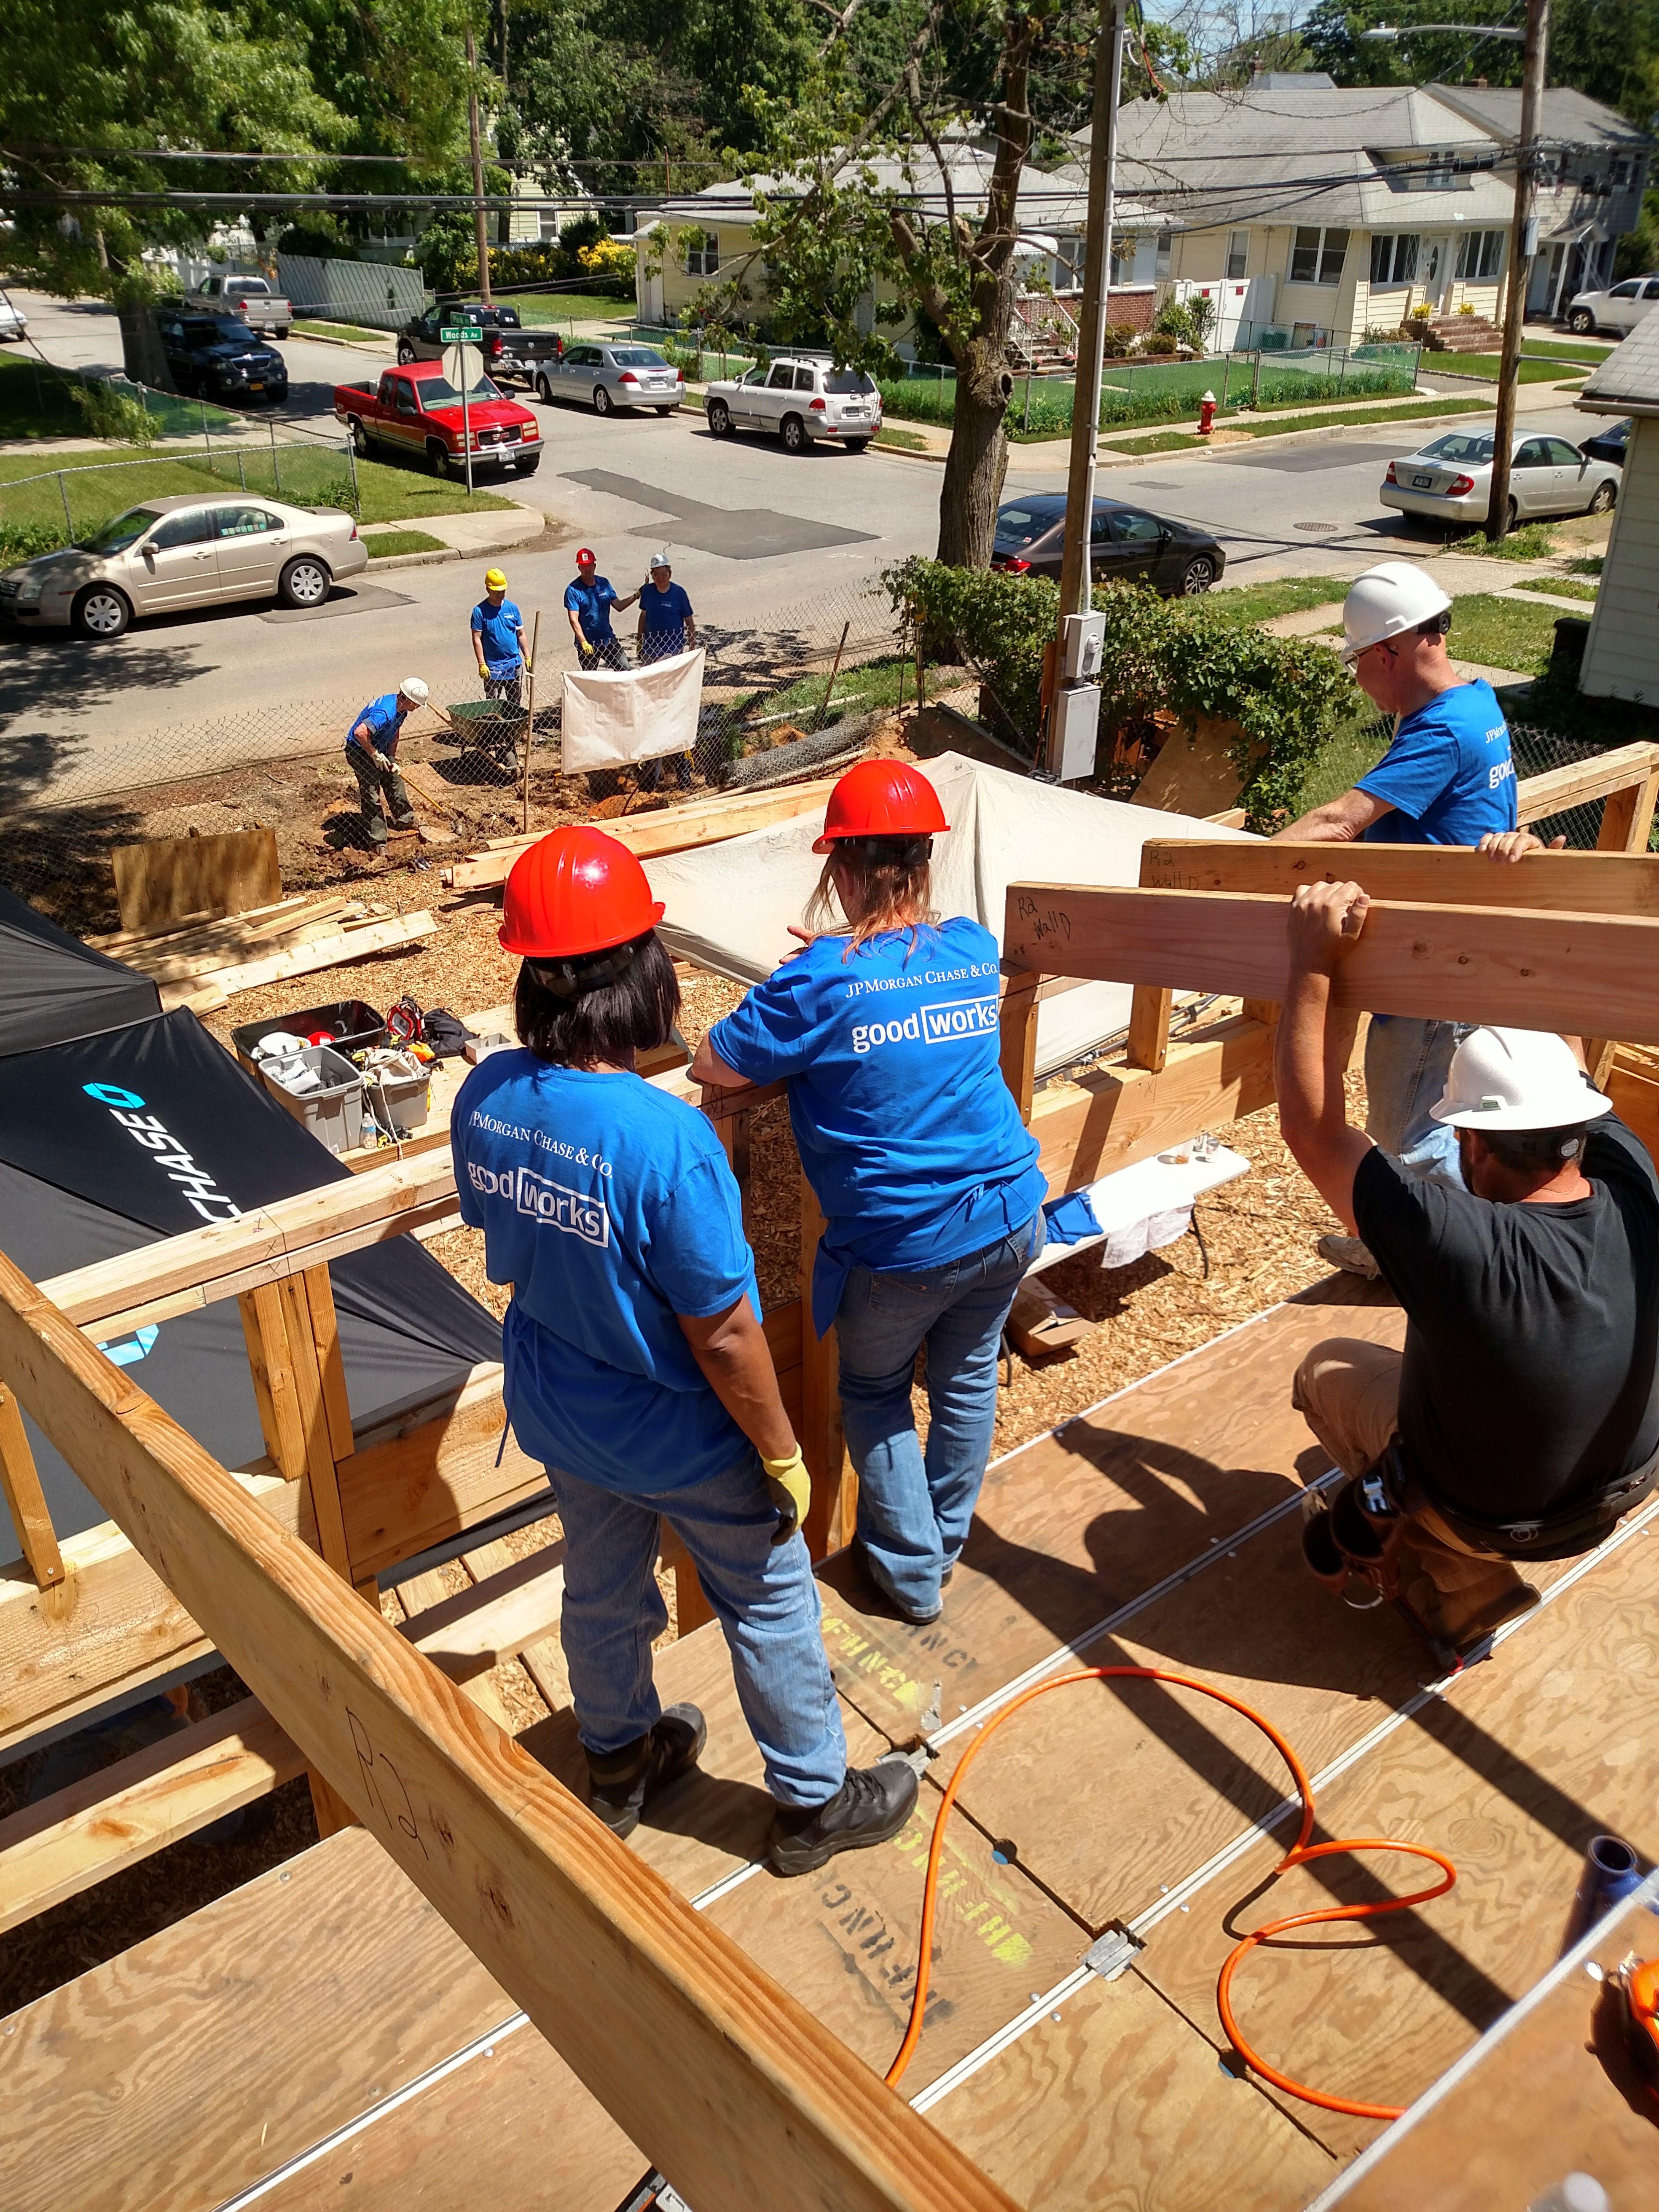 JPMorgan Chase Build Day